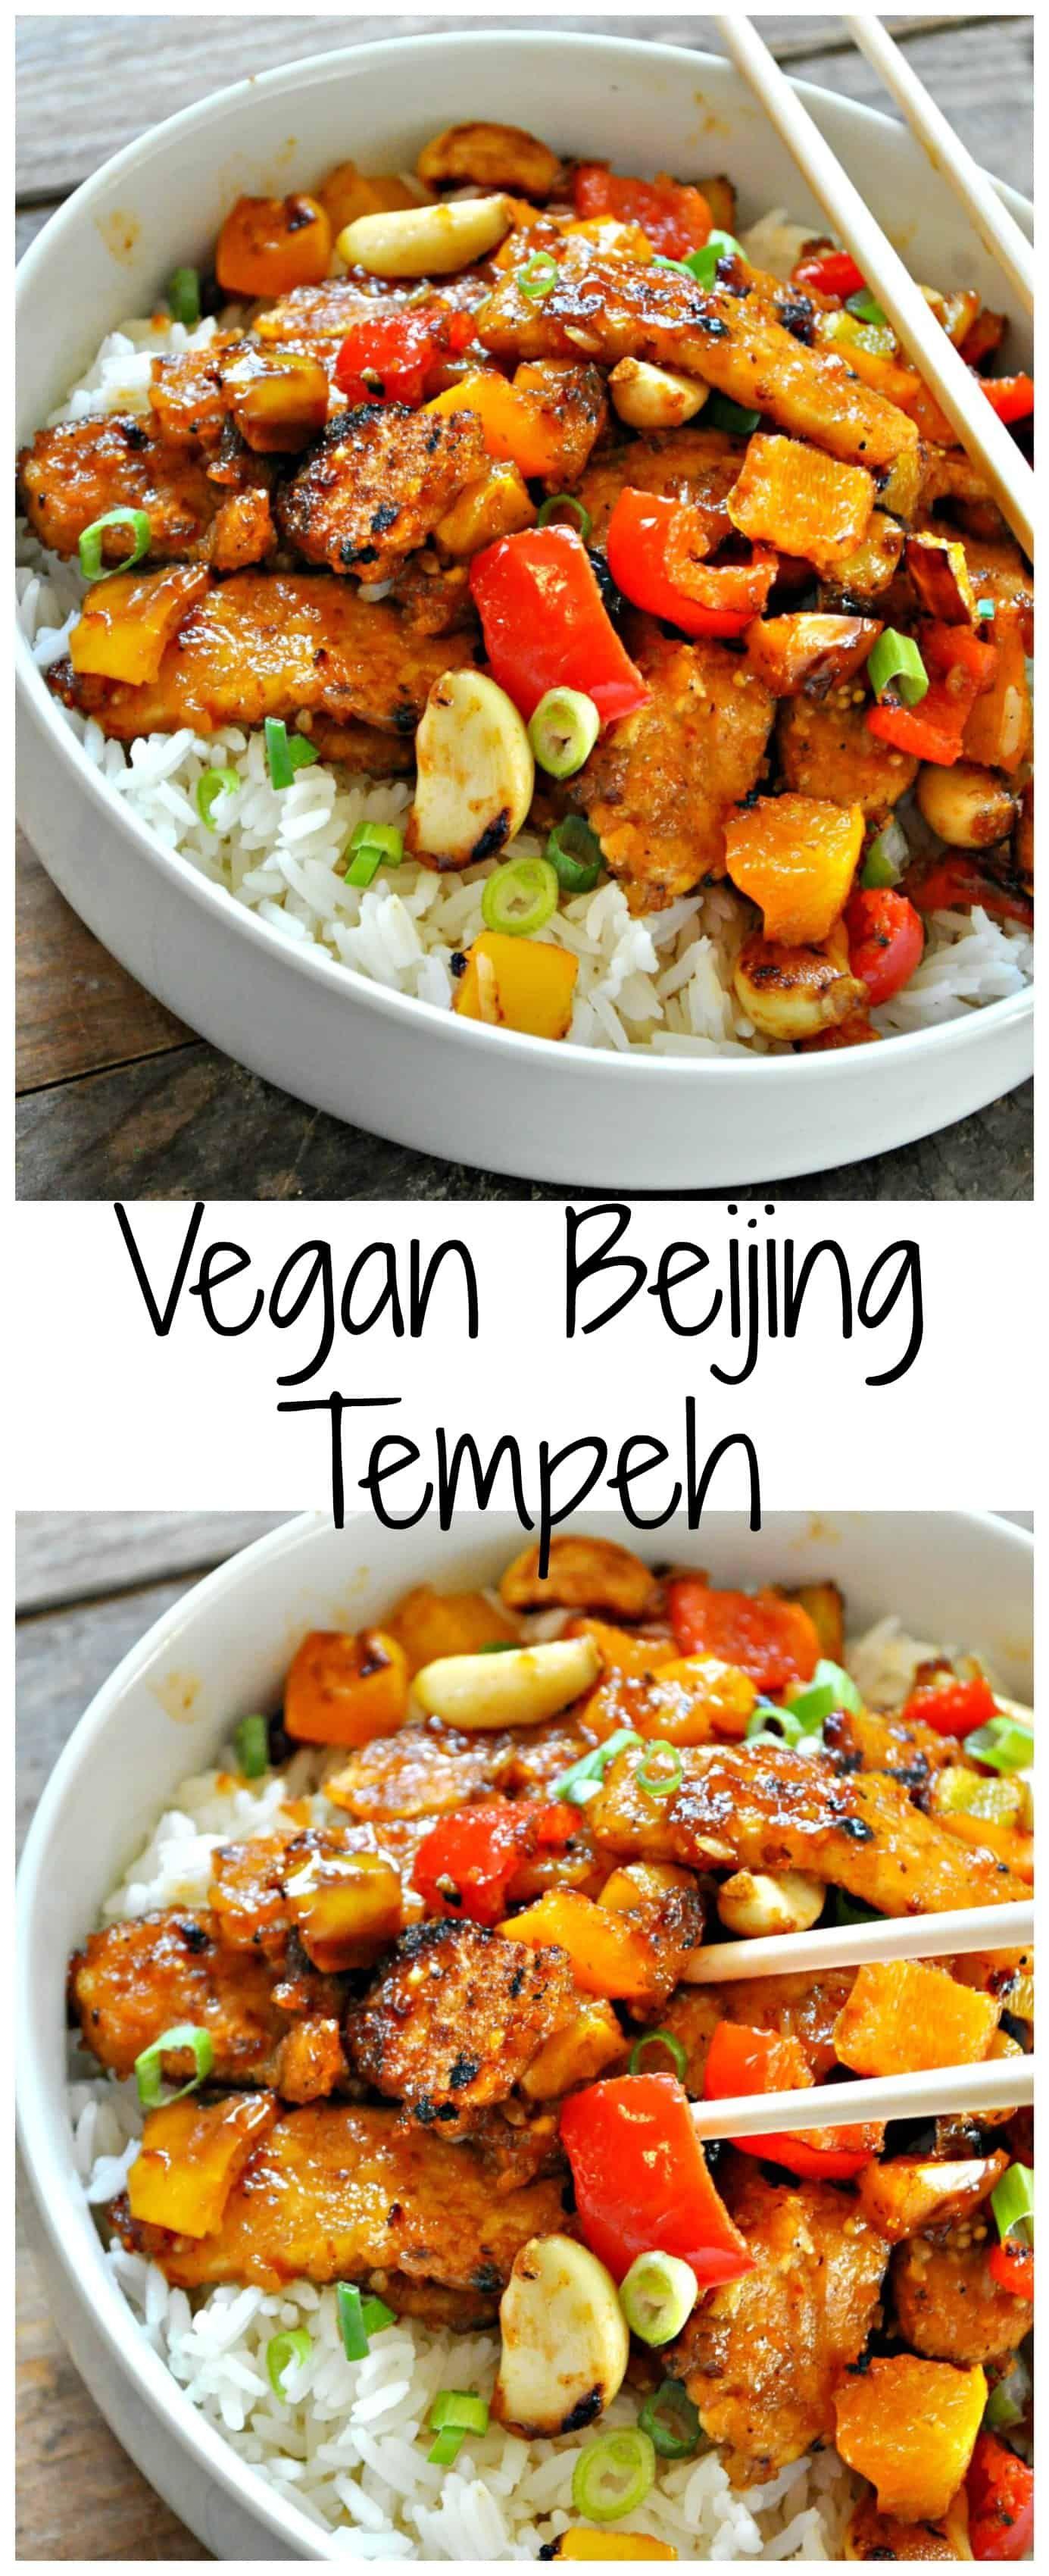 Vegan Beijing Tempeh Recette Cuisine Vegetarienne Plat